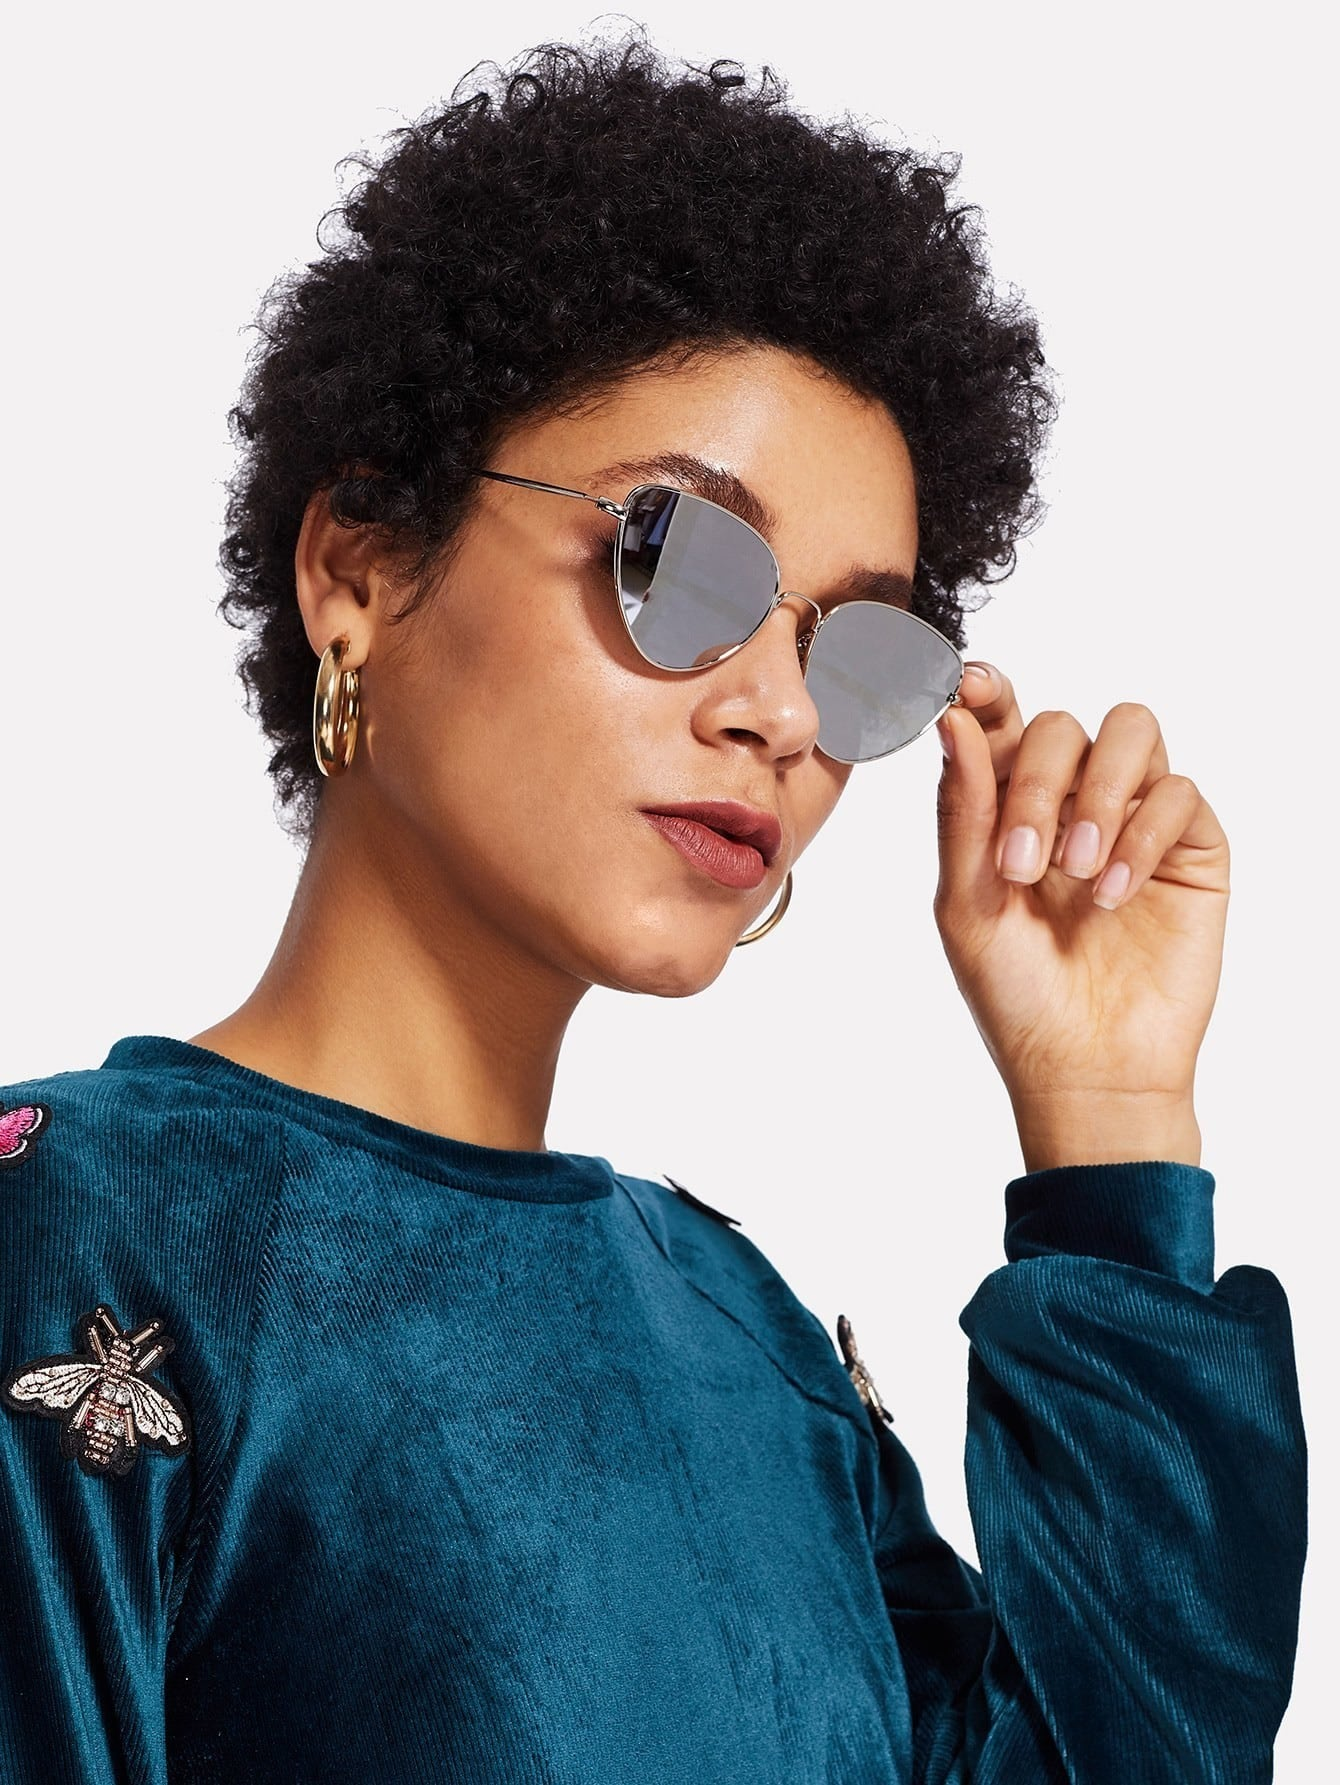 Cat Eye Metal Frame Sunglasses ladies cat eye sunglasses women 2016 new metal frame sexy sunglasses glasses luxury sunglasses female oculos de grau femininos